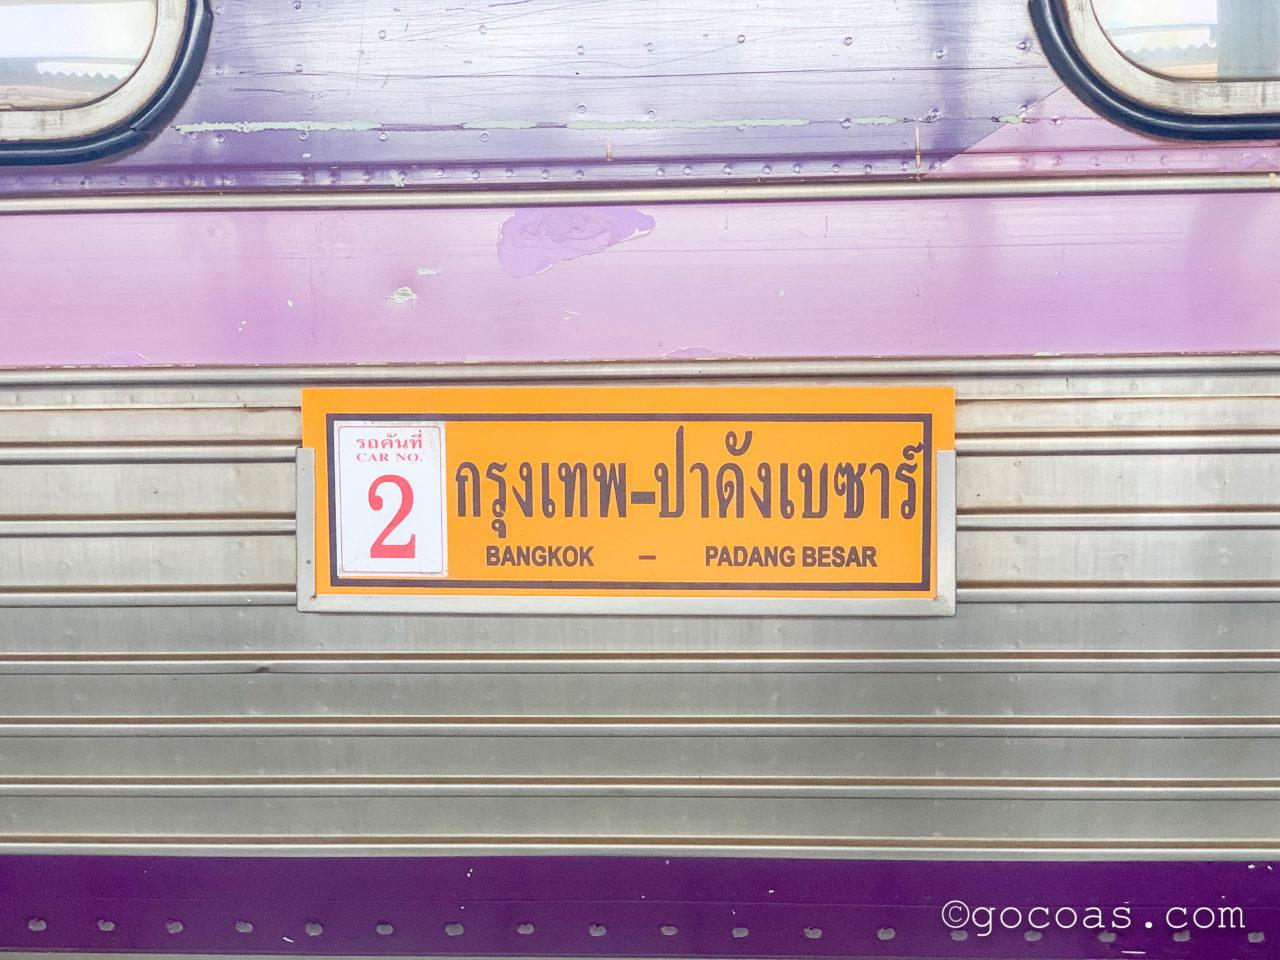 Hua Lamphong駅に停車している電車の行き先の表札